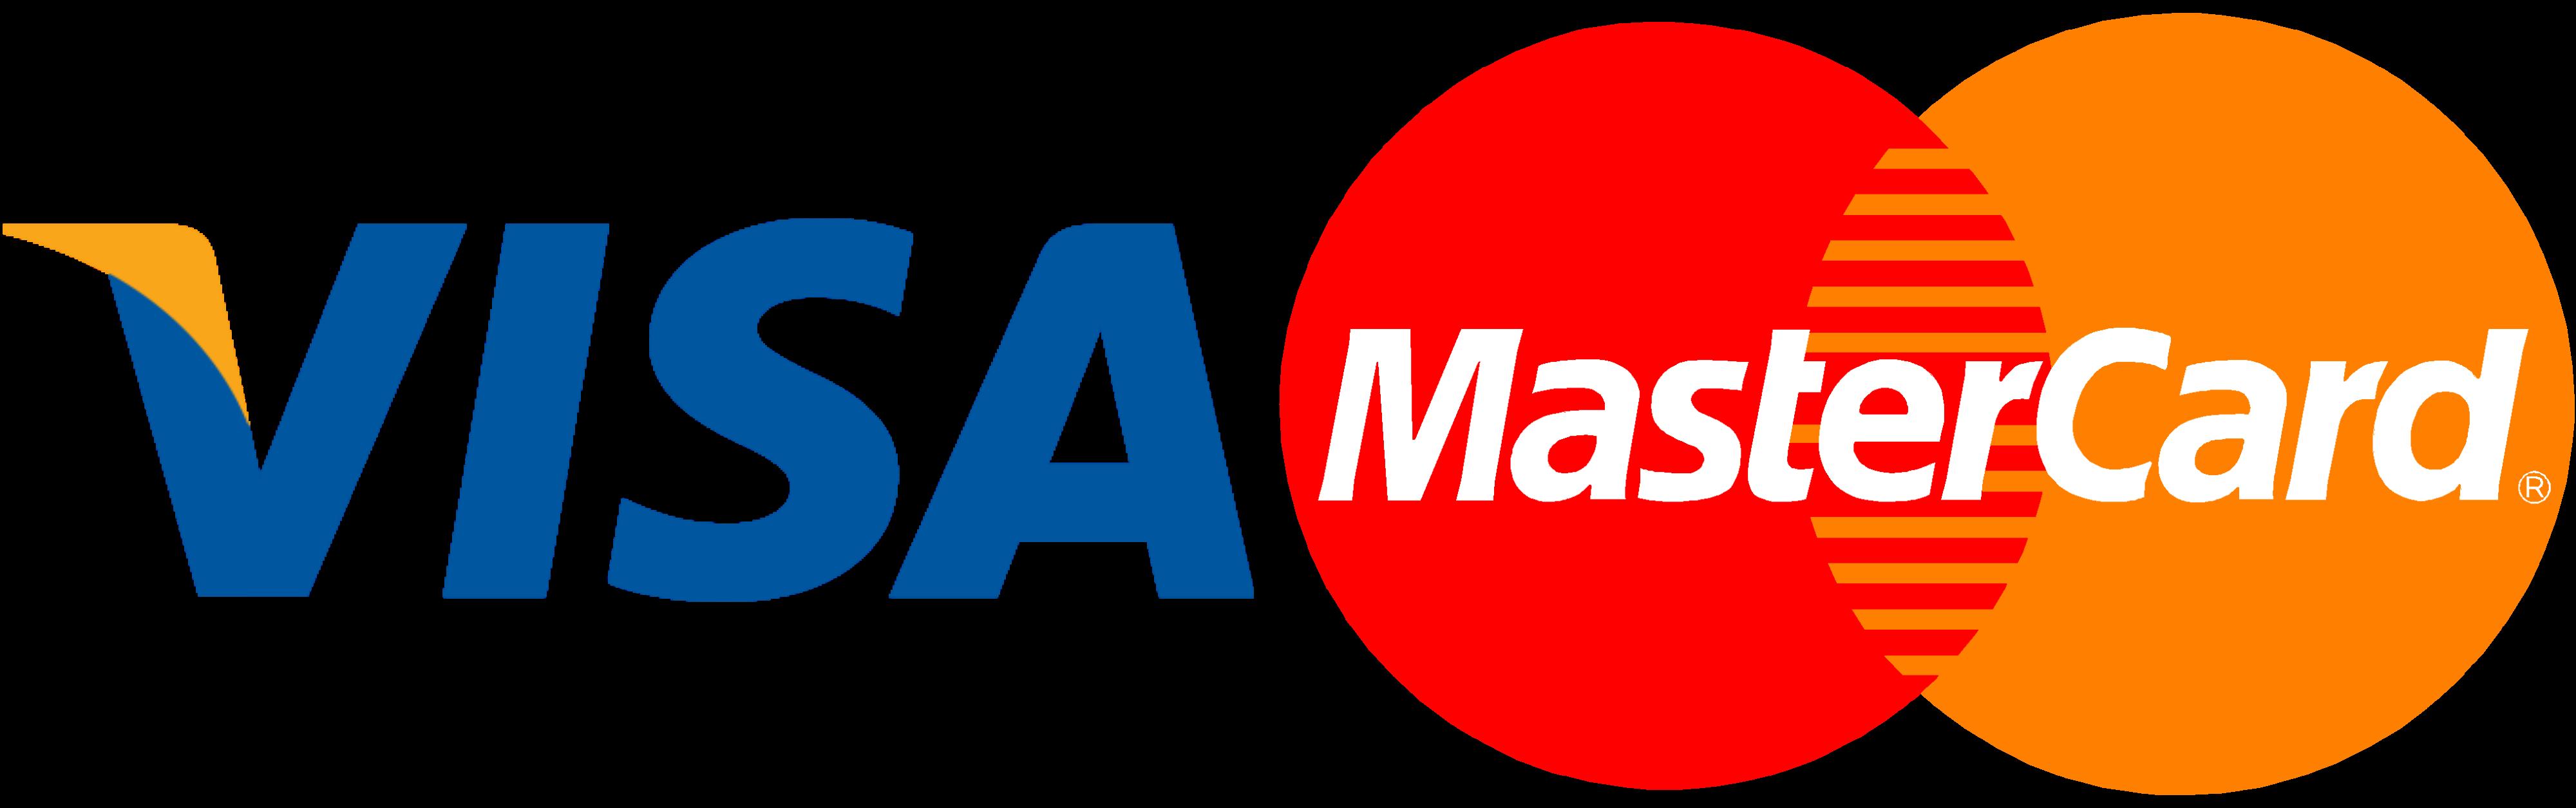 MAIDPROVIDER.PH – Philippines's No. 1 Maid Agency Brand